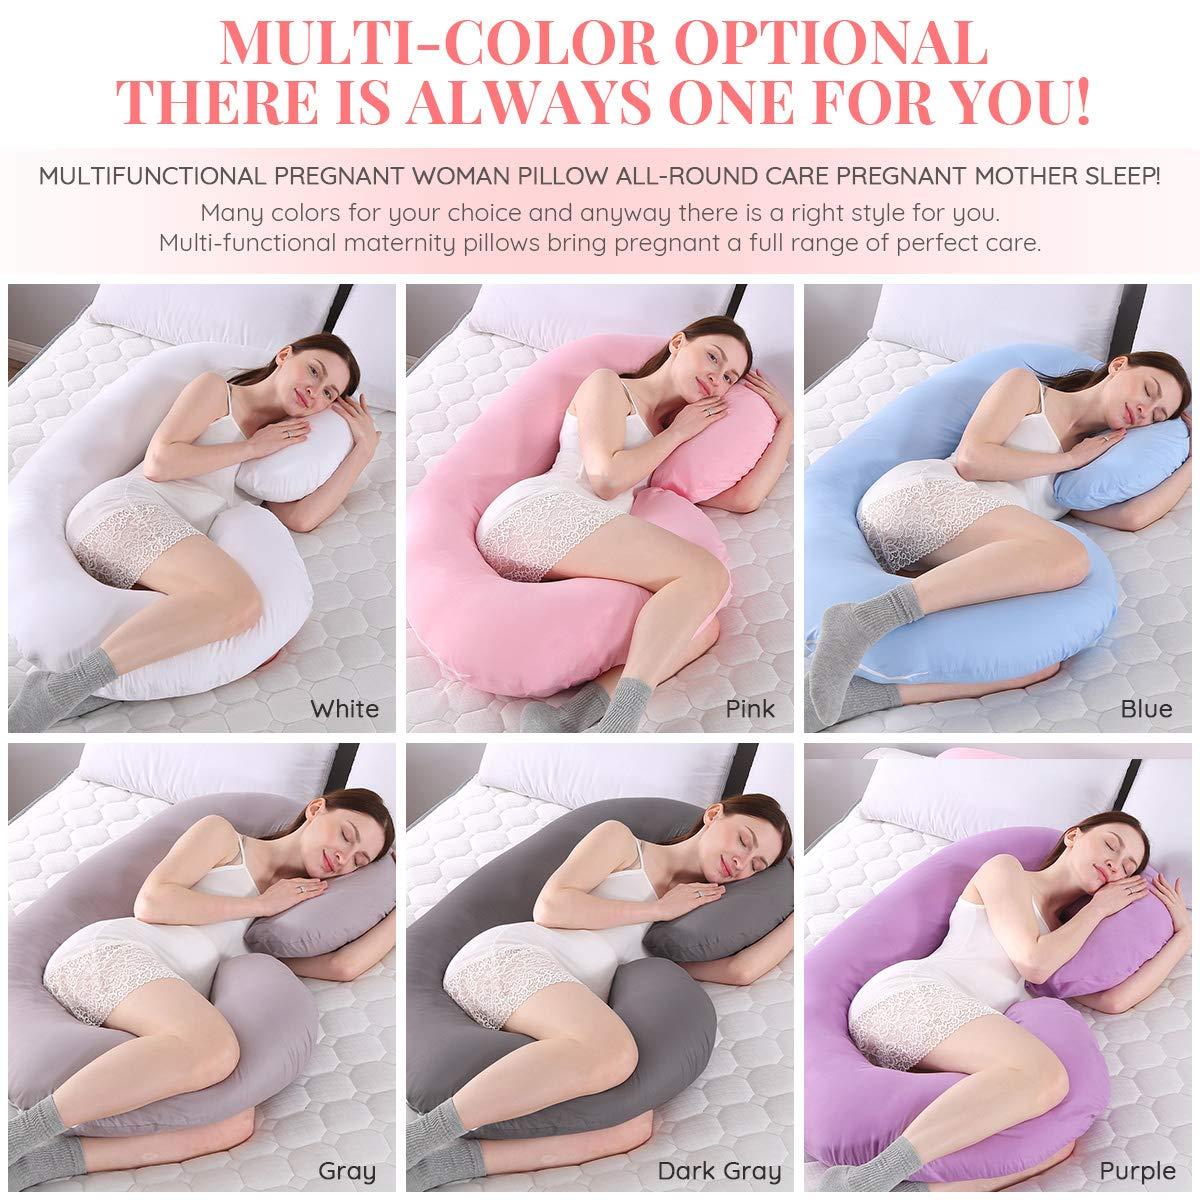 MINGPINHUIUS Pregnancy Body Pillow with Pillowcase Pregnancy Pillow and Maternity Pillow for Pregnant Women Sleeping 51 Fuller Cotton C Shaped Pink